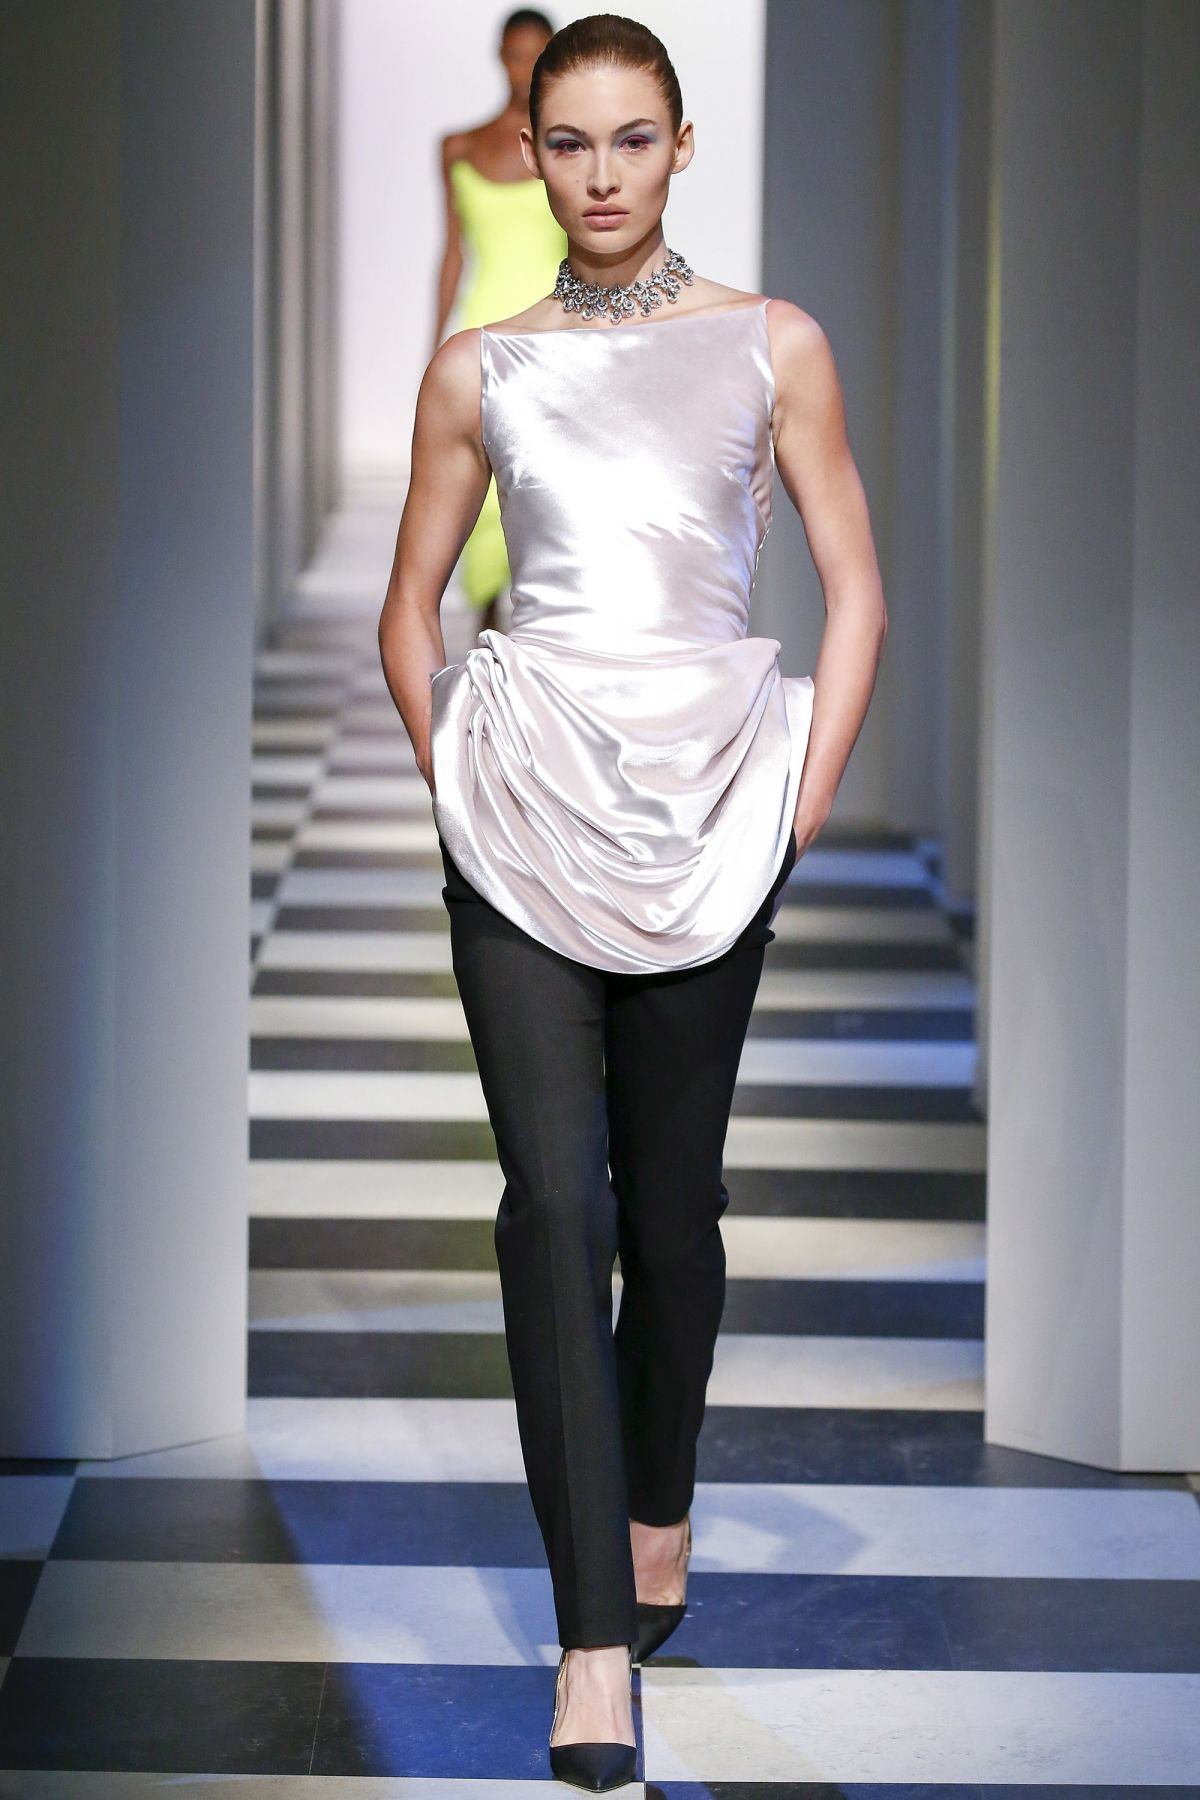 GRACE ELIZABETH at Oscar De La Renta Fashion Show in New York 02/18/2017